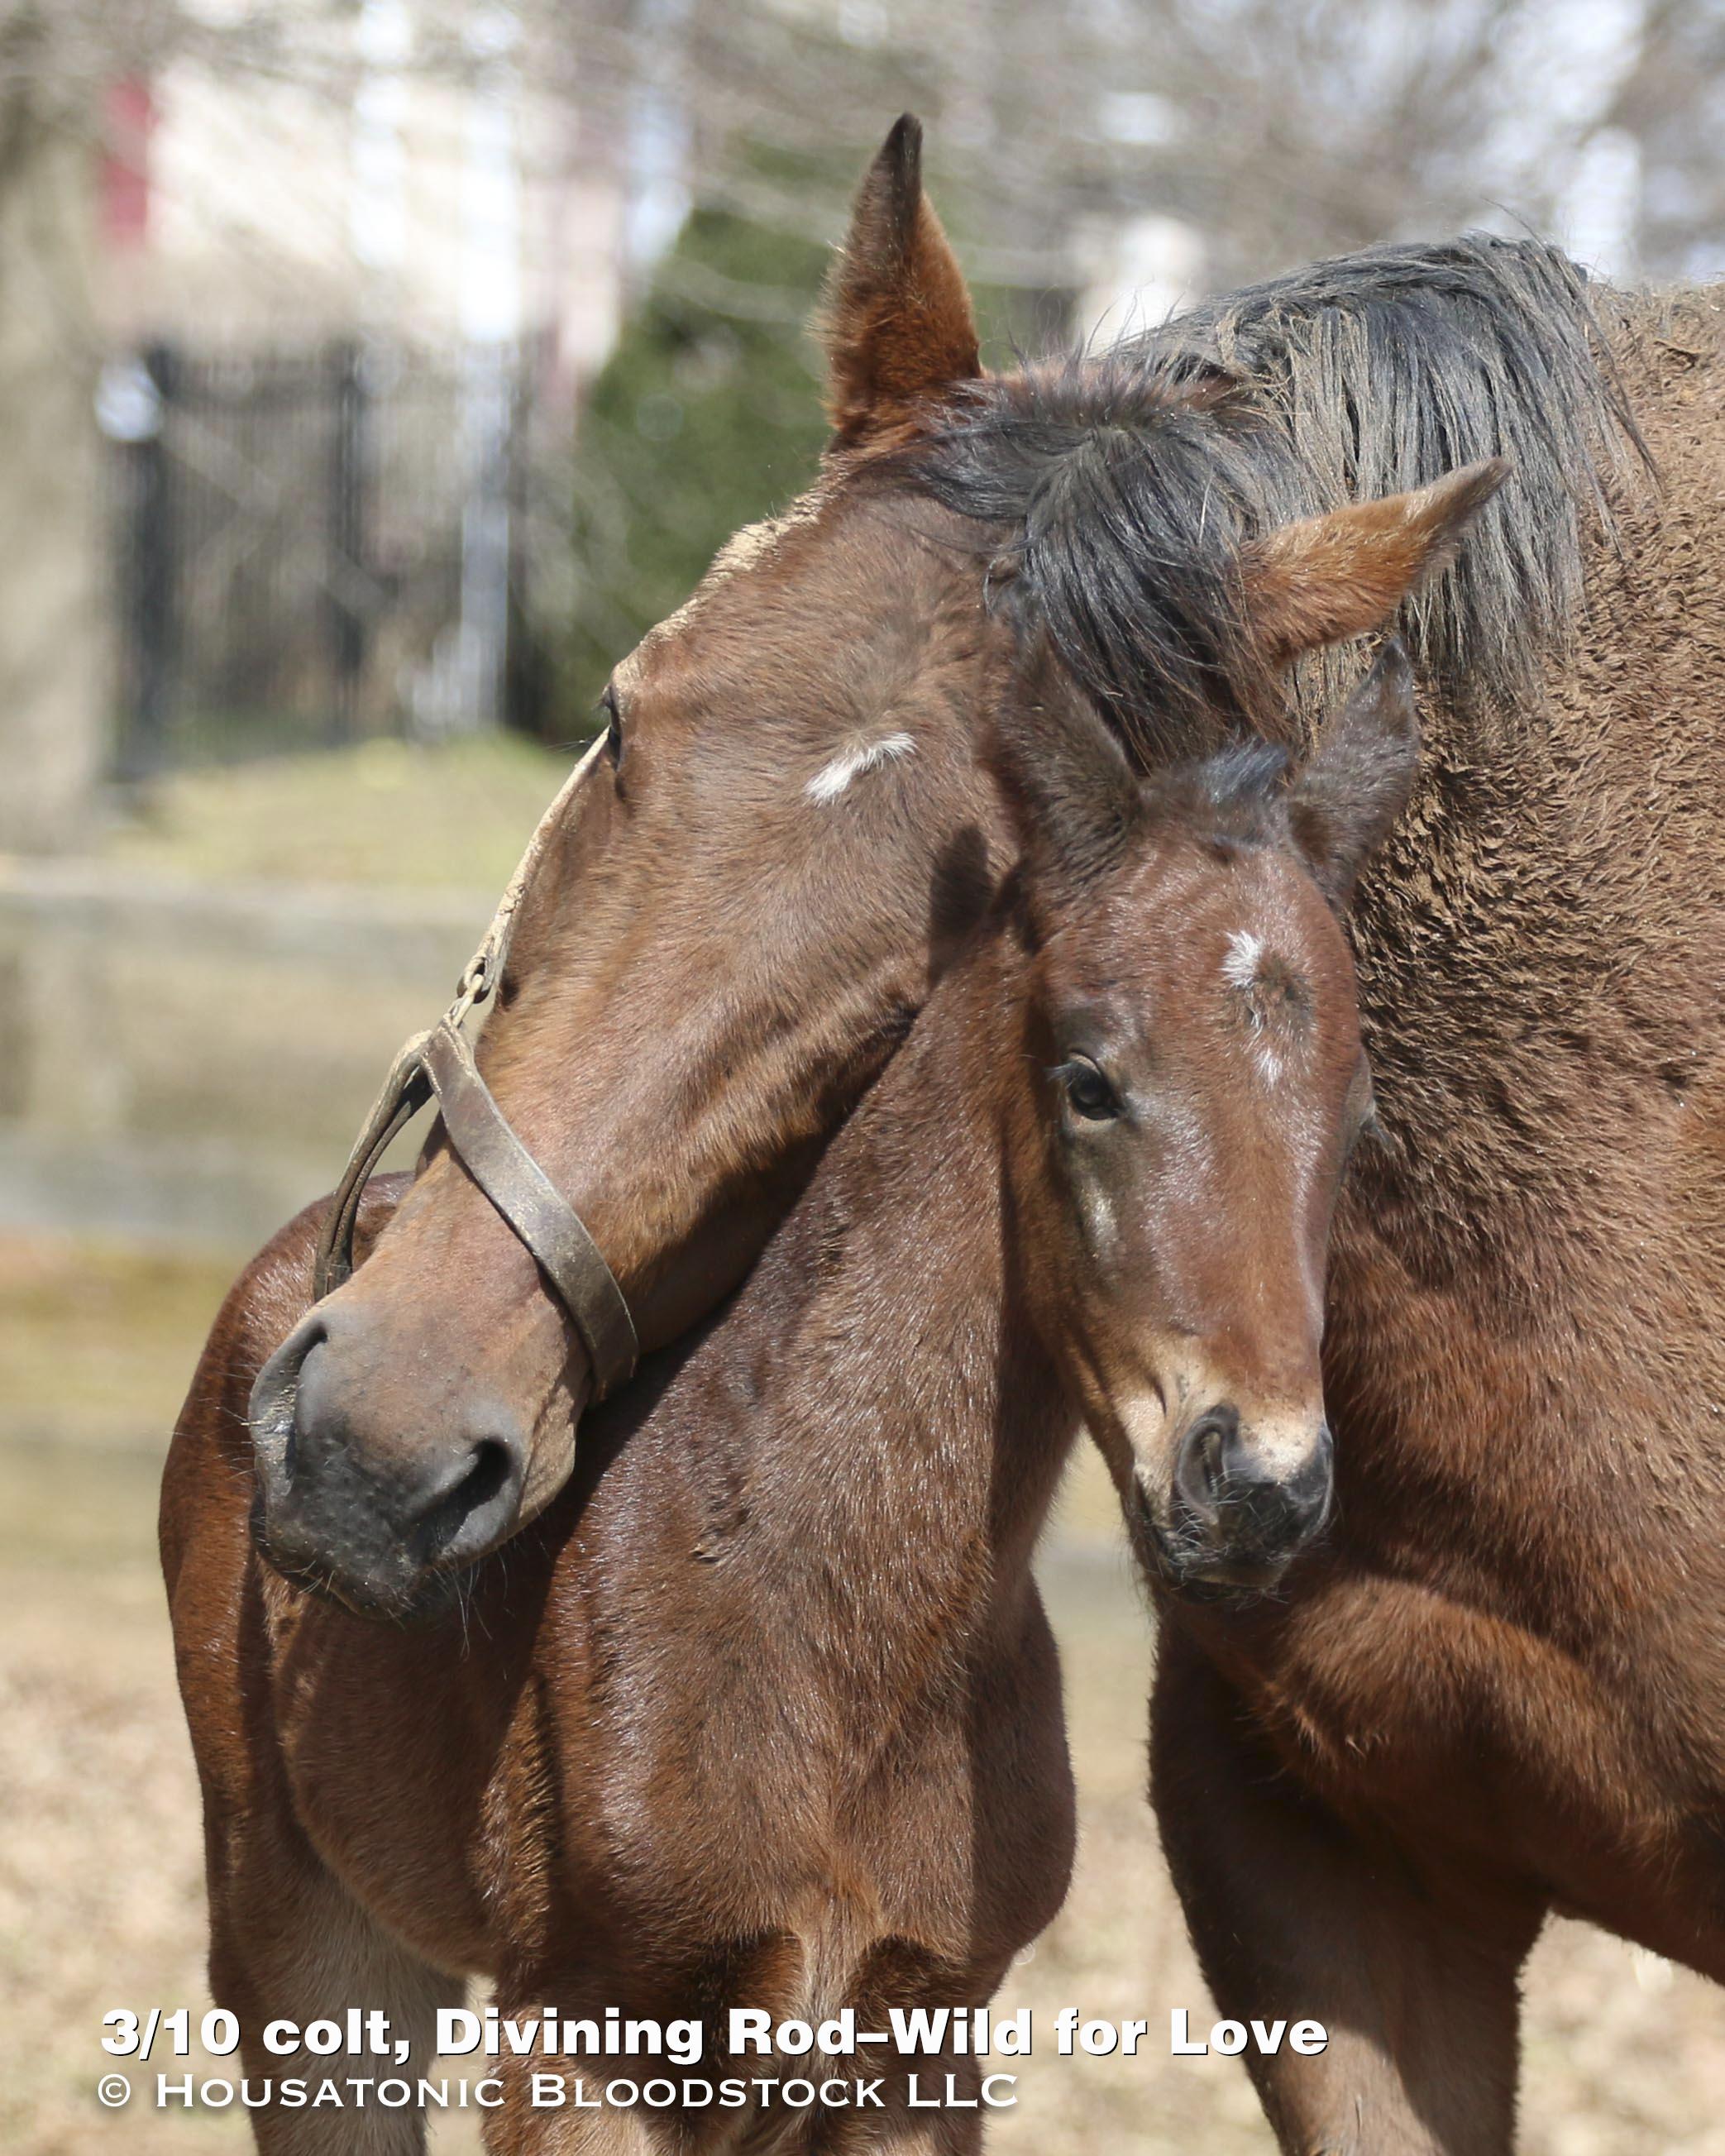 MD Breds - Maryland Horse Breeders Association